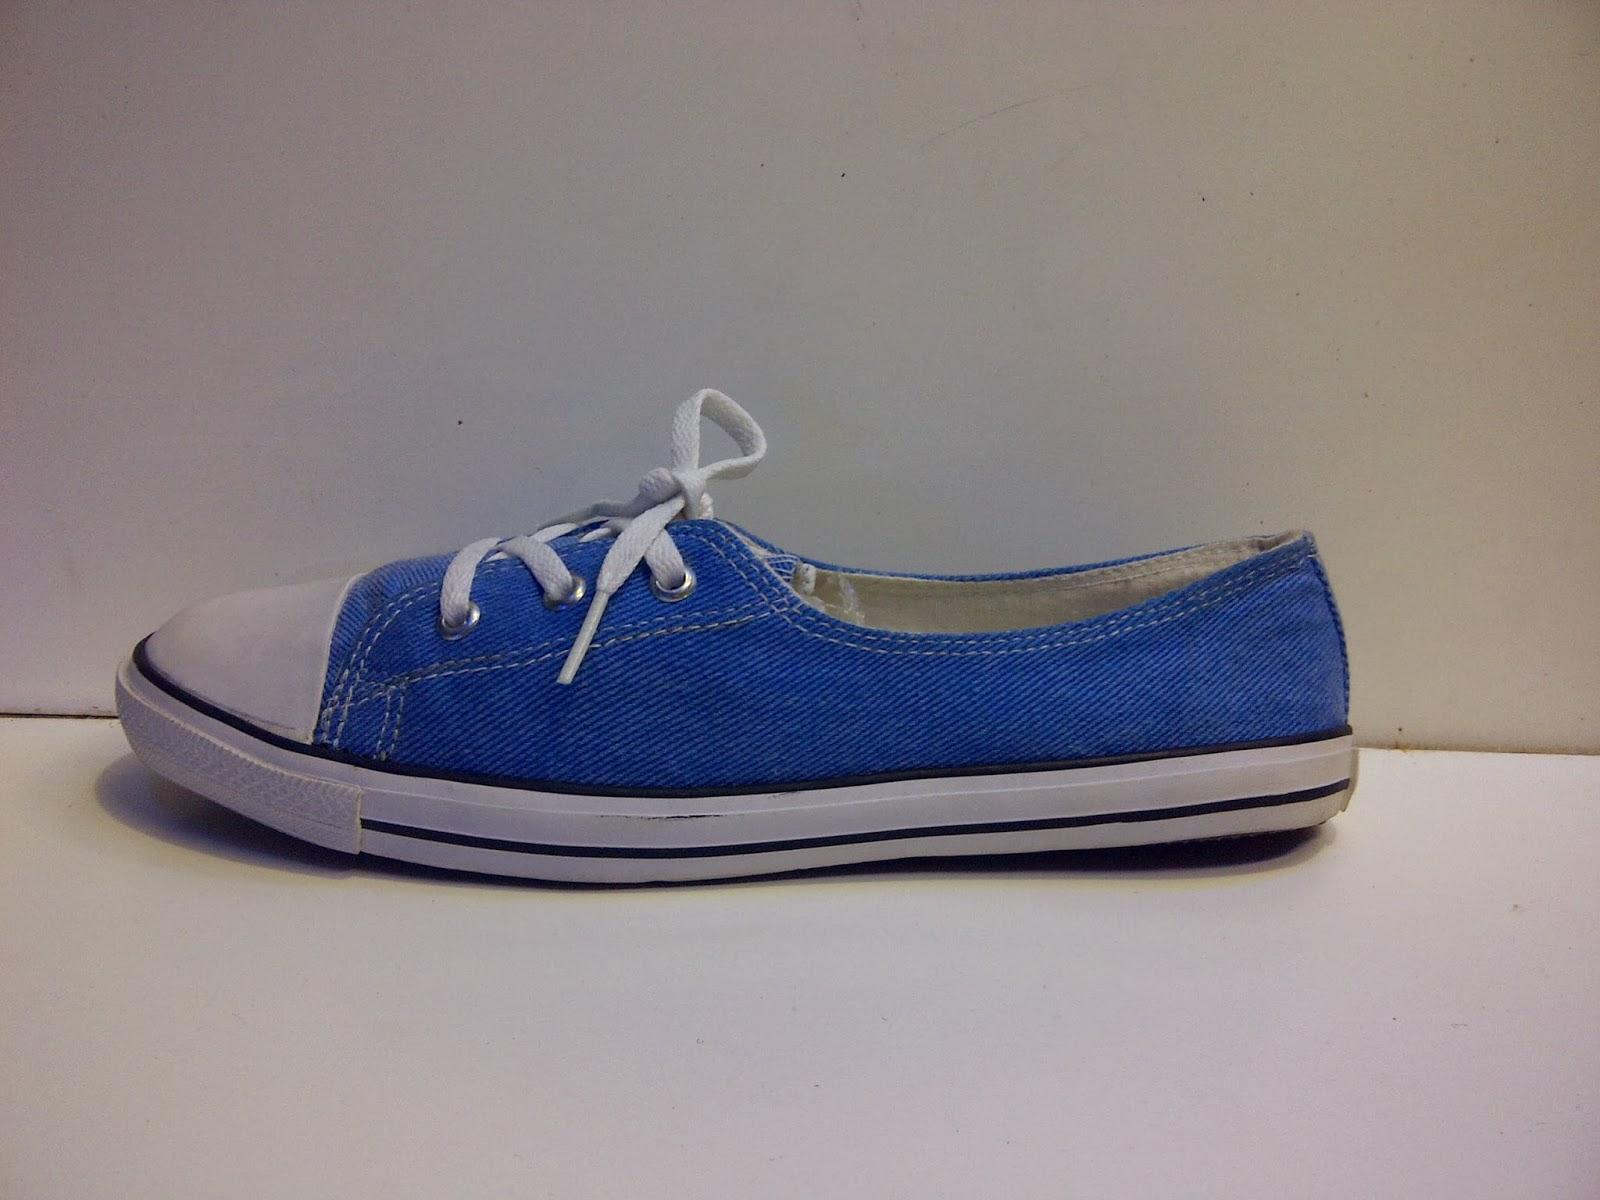 Sepatu Converse Slop Women's biru grosir,converse biru,sepatu sekolah